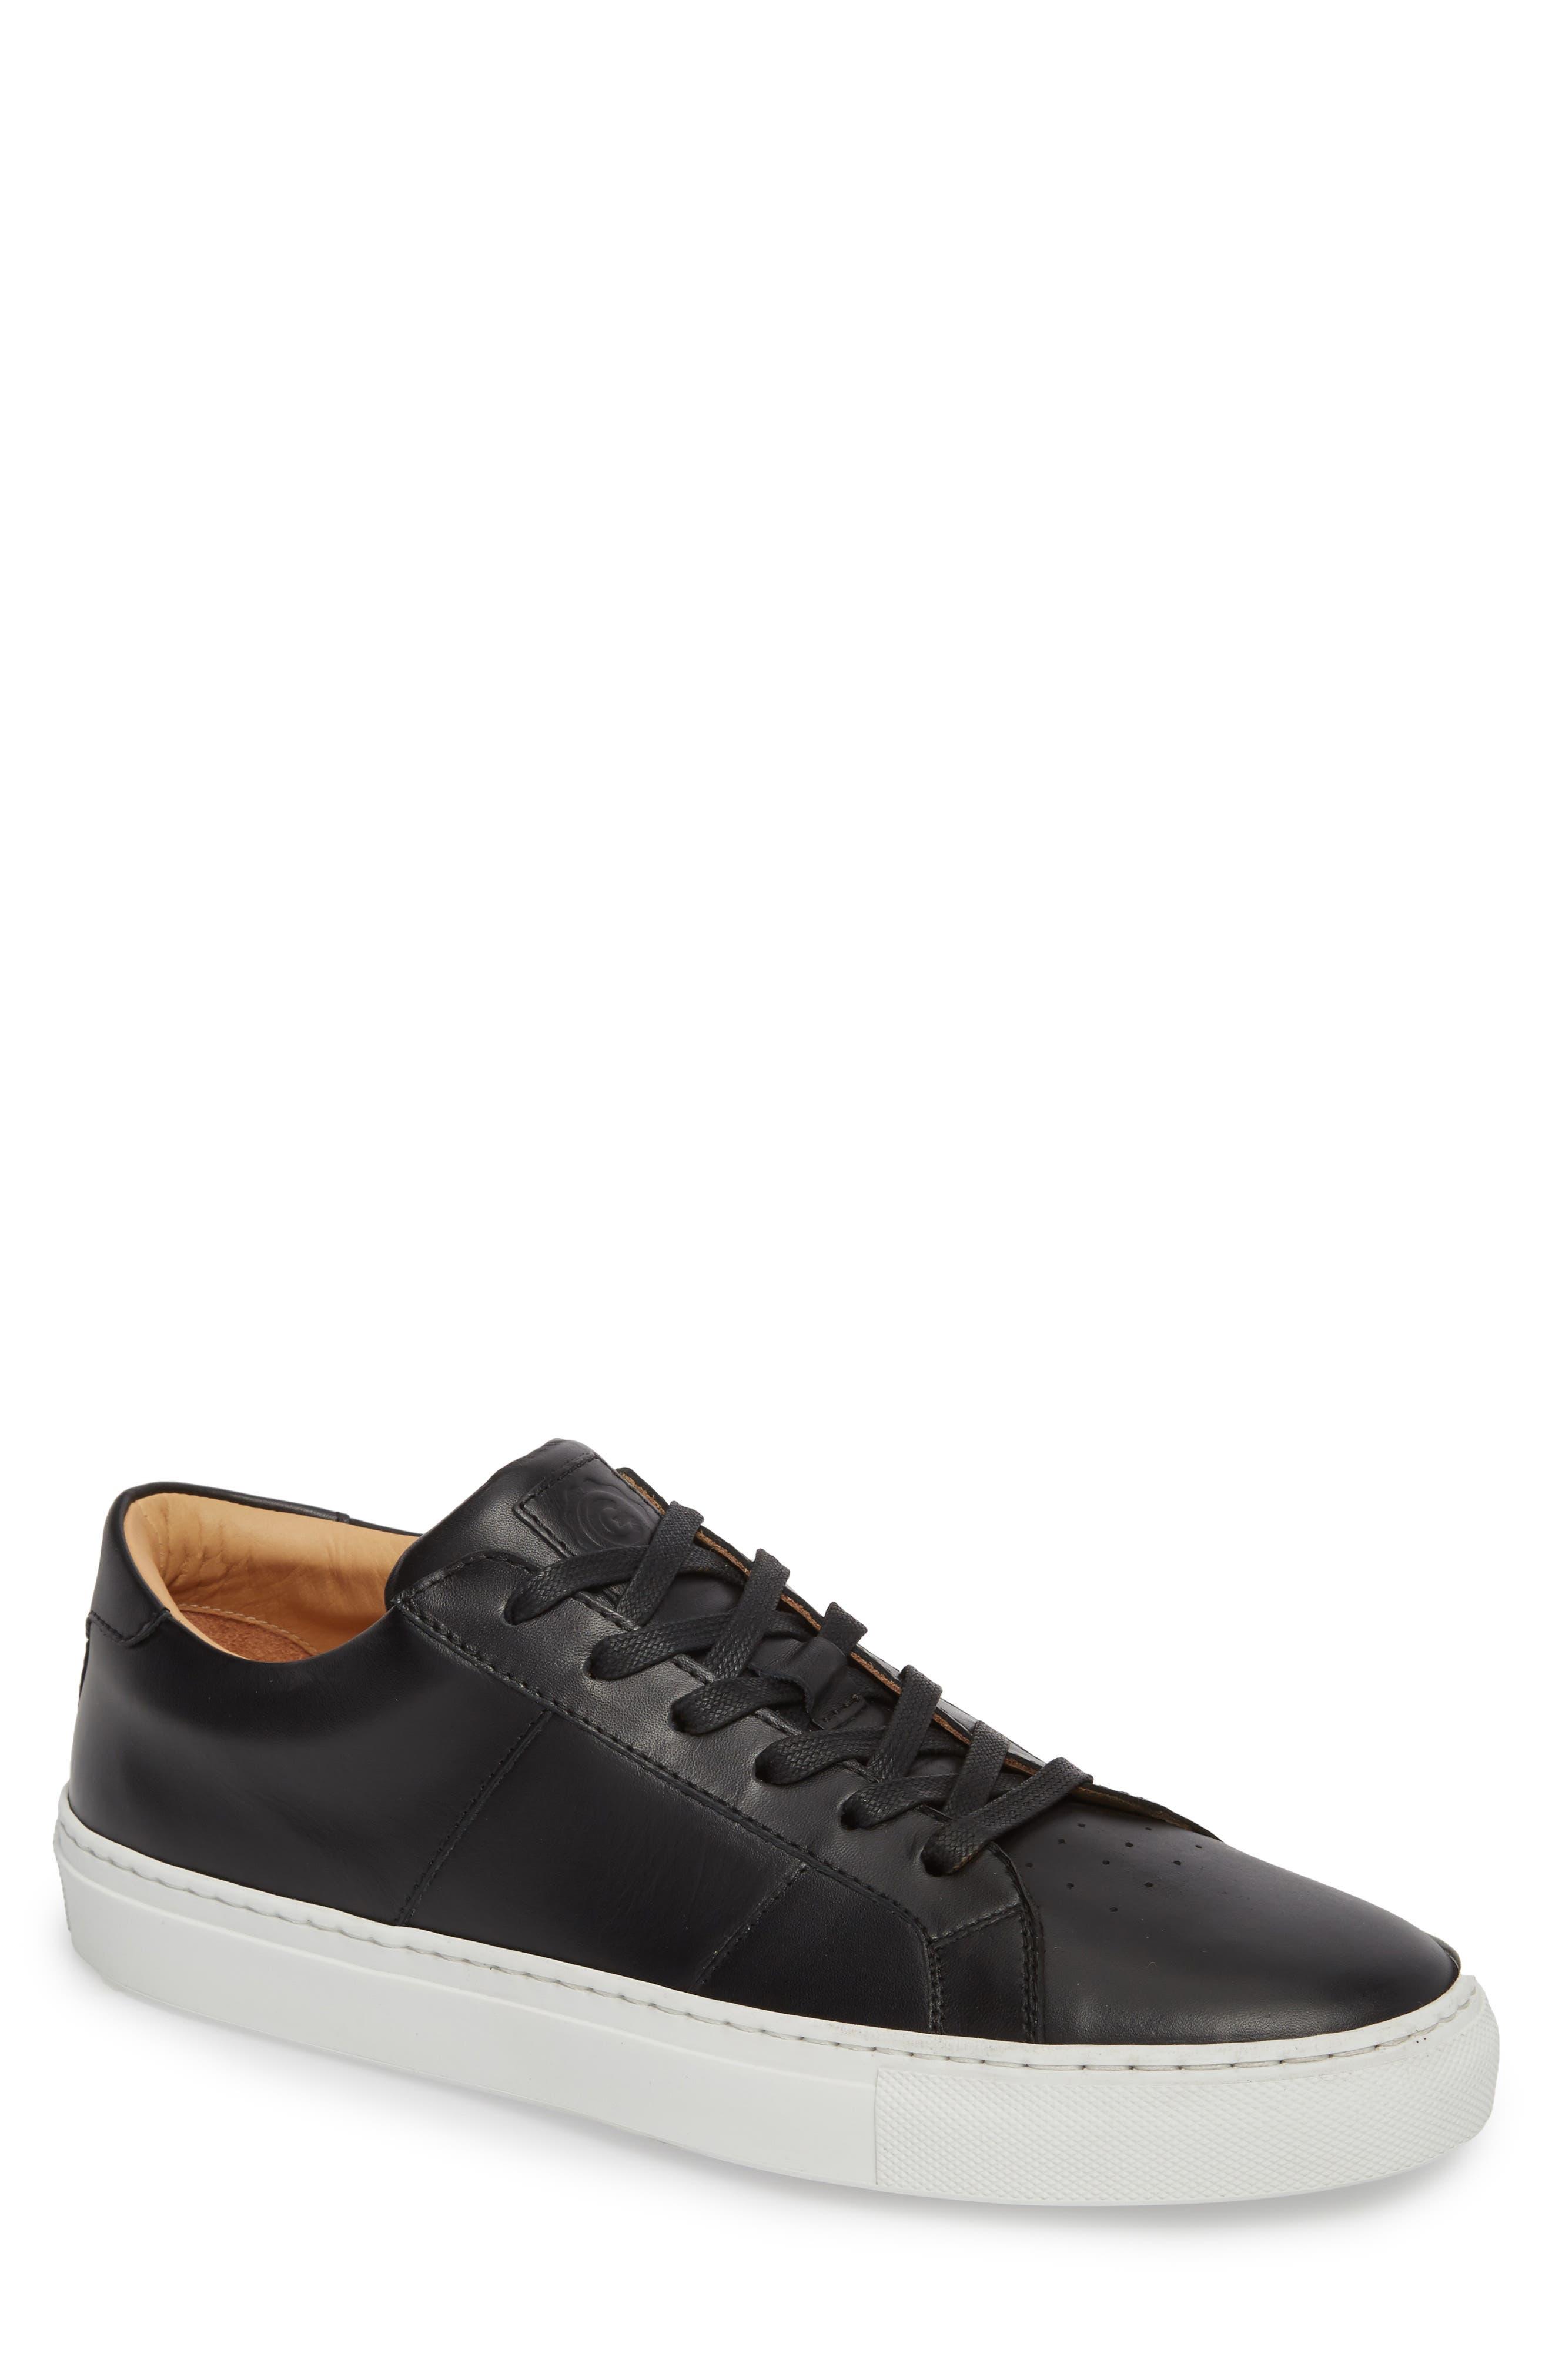 Royale Sneaker,                             Main thumbnail 1, color,                             BLACK LEATHER